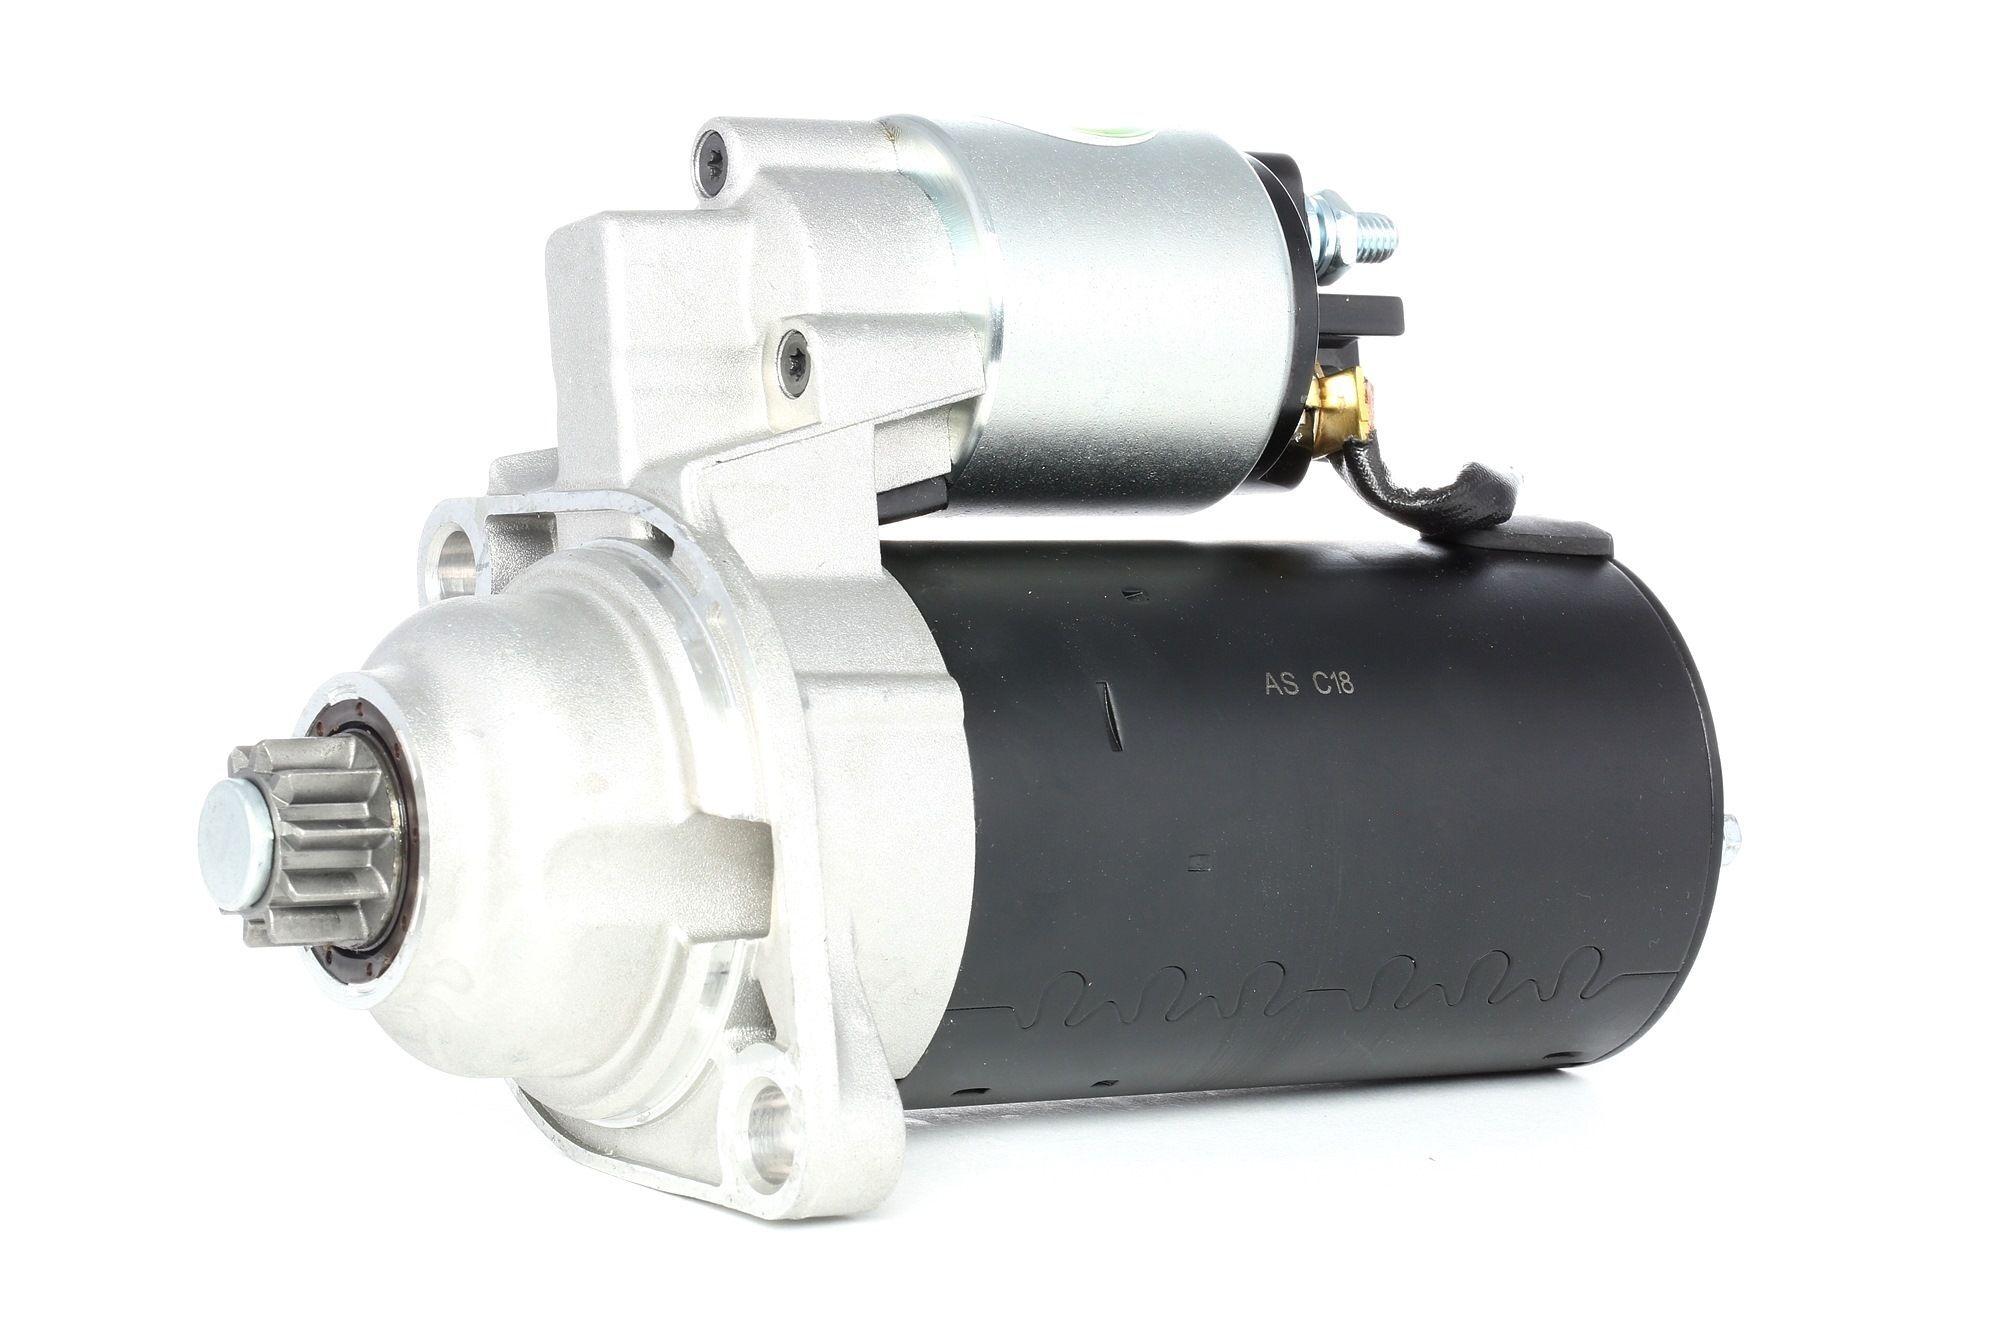 AS-PL Starttimoottori Brand new AS-PL Alternator S0025 Startti,Käynnistinmoottori VW,SKODA,FORD,GOLF IV 1J1,POLO 9N_,TOURAN 1T1, 1T2